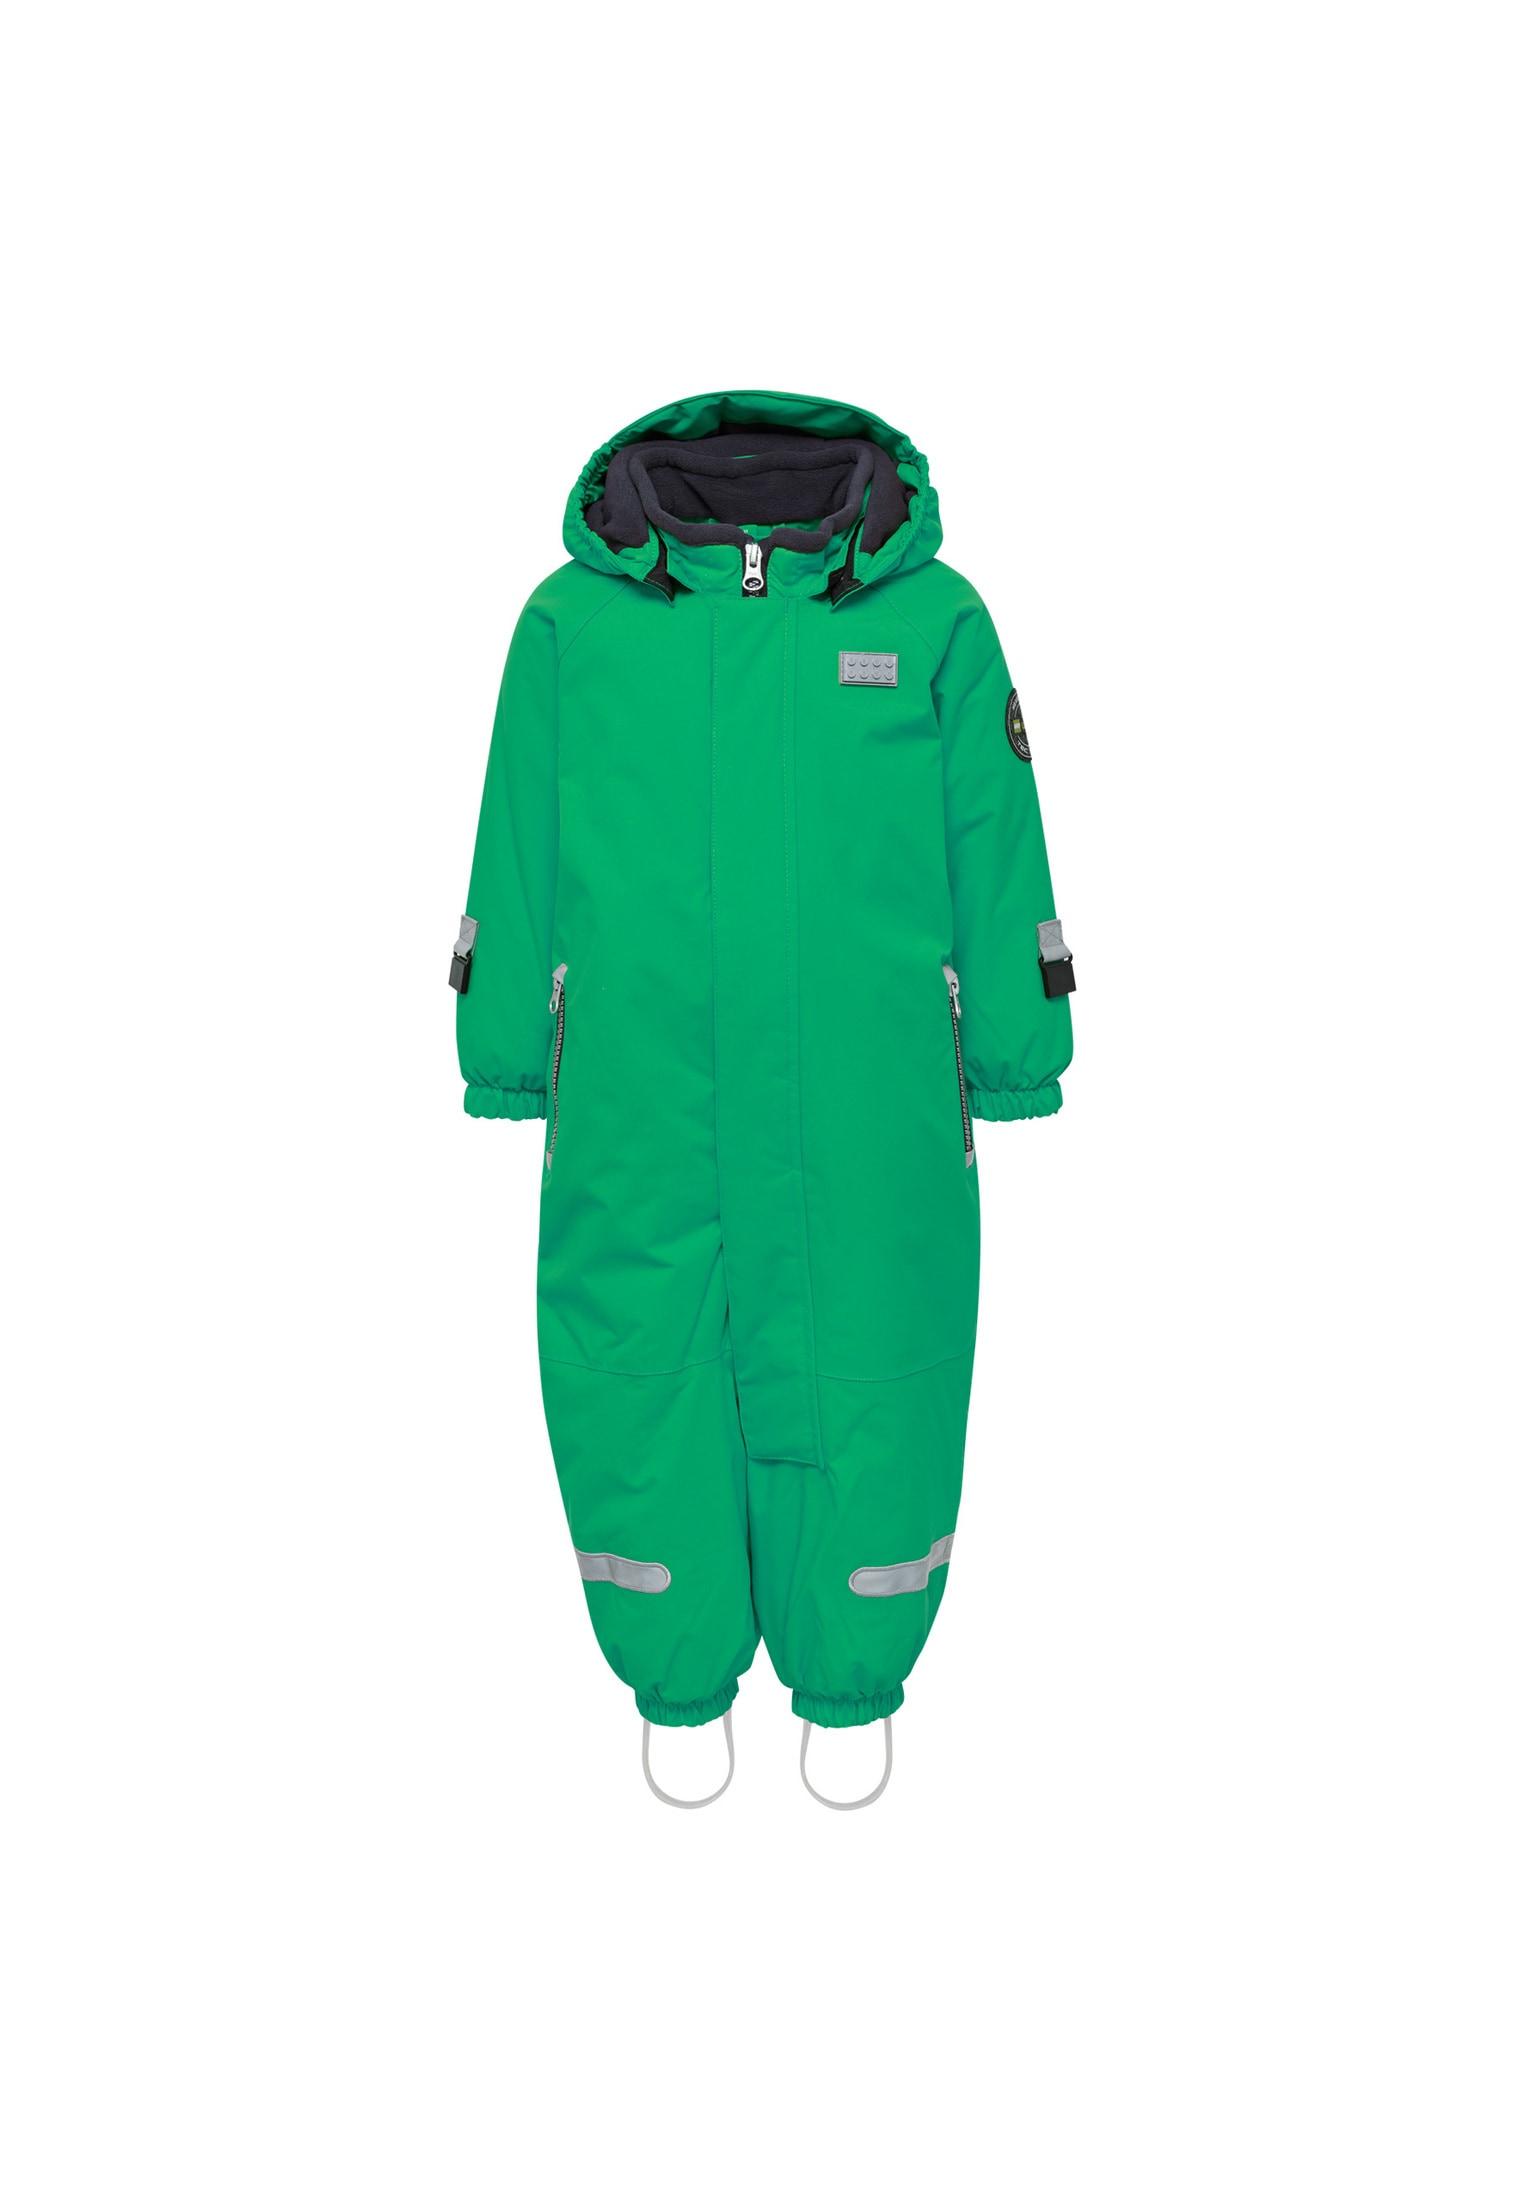 LEGO Wear Skianzug LWJULIAN 711 grün Jungen Schneeanzüge Schneebekleidung Jungenkleidung